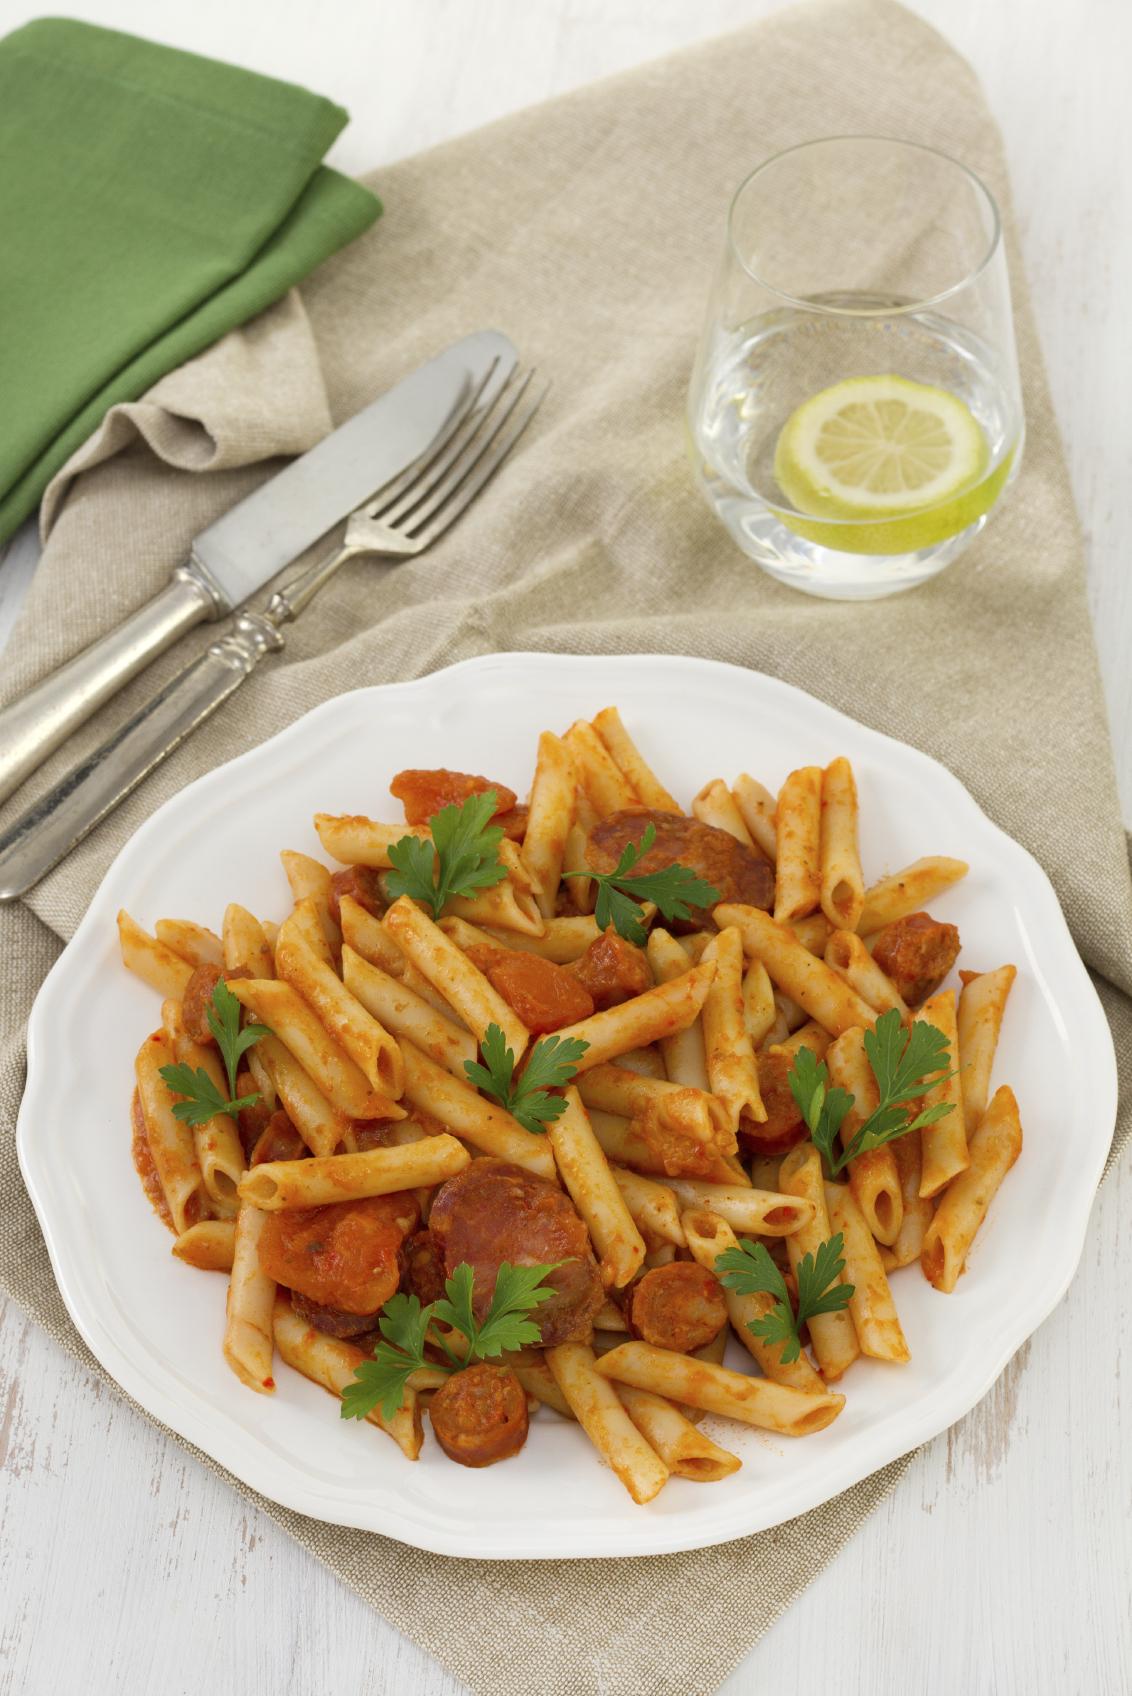 Pasta con chorizos criollos y salsa de tomate aromática